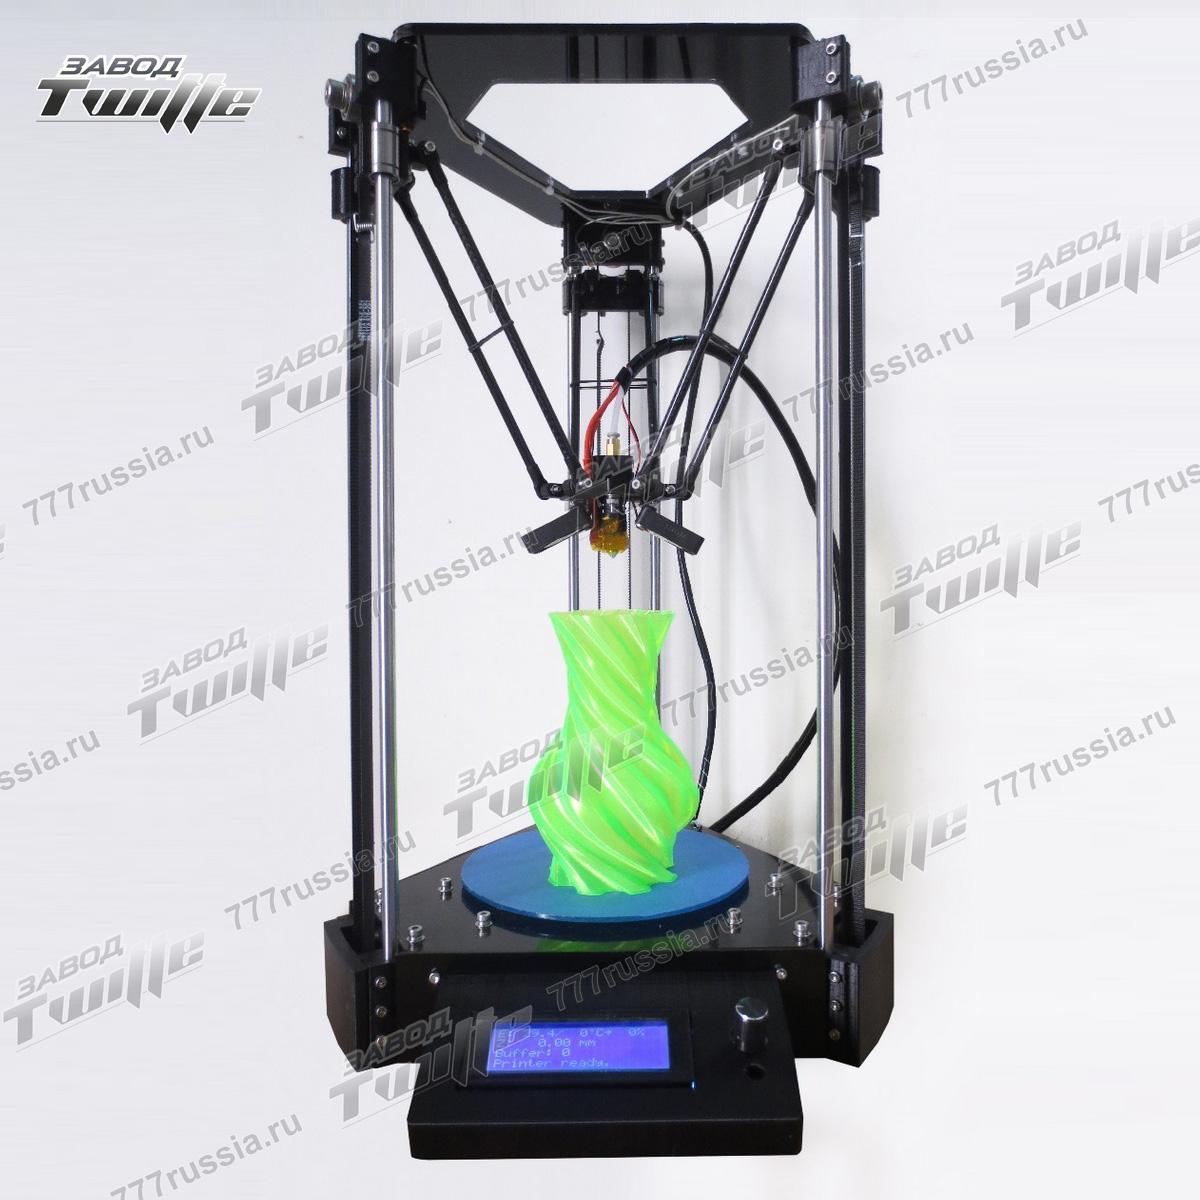 http://777russia.ru/galery/produkciya/3dprinters/3d_printer_mini.jpg